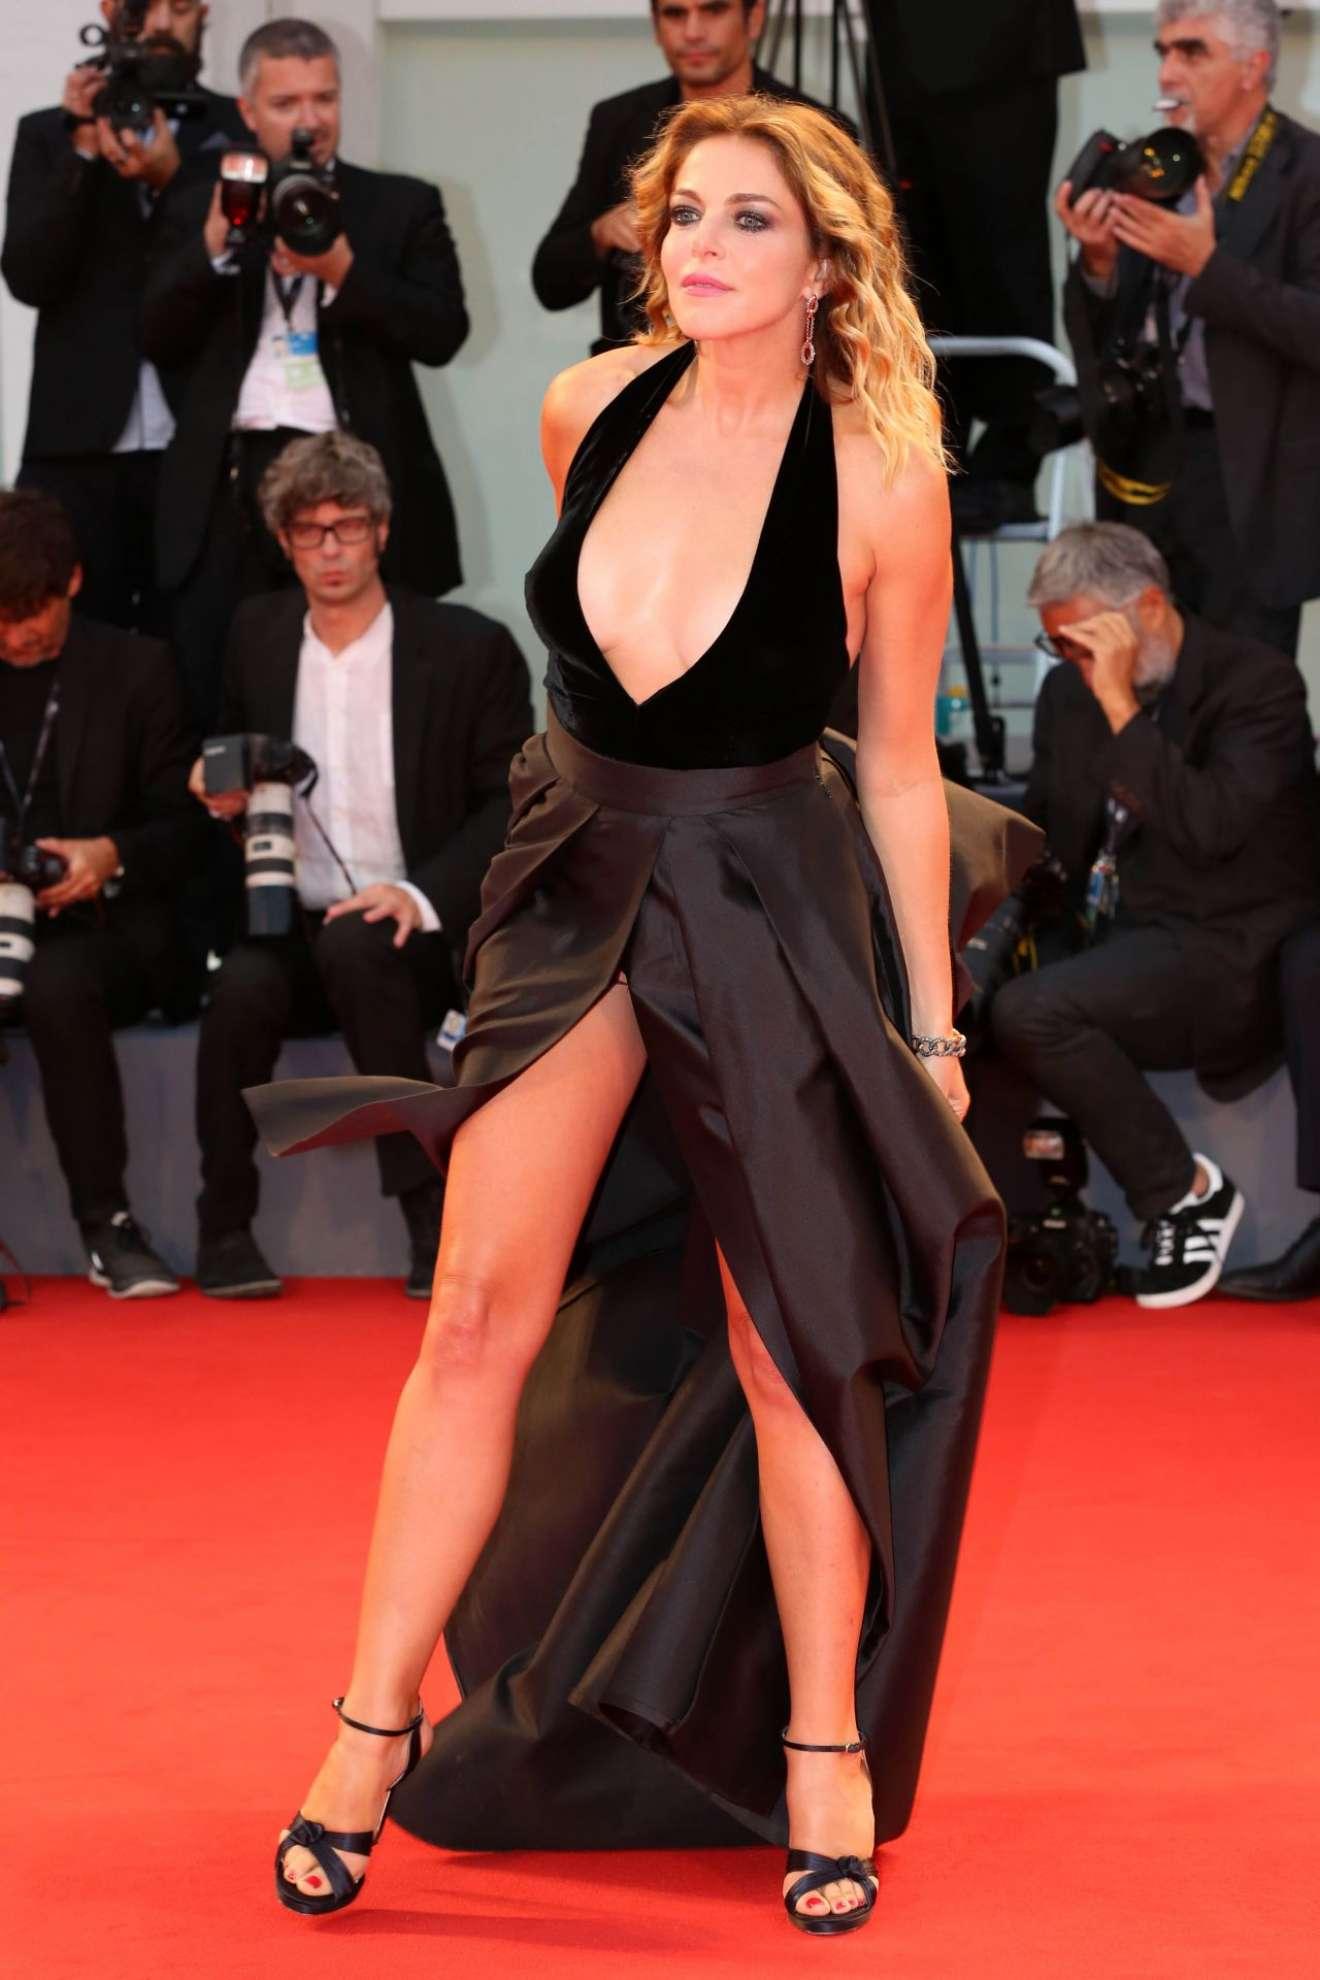 Photos Claudia Gerini naked (52 photos), Pussy, Hot, Twitter, butt 2015